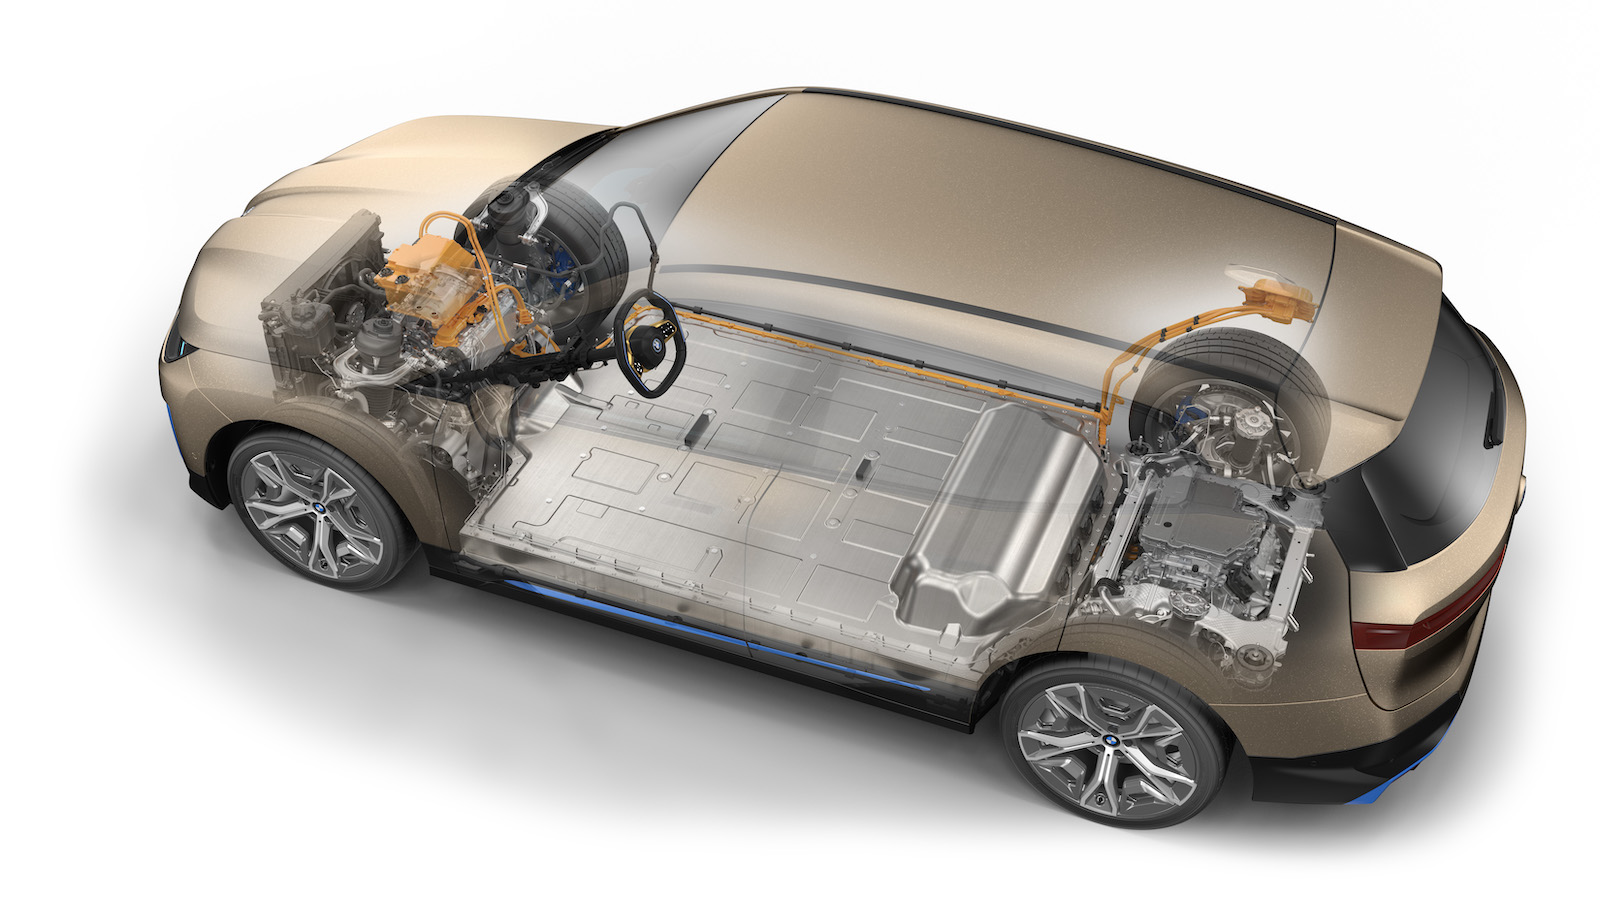 BMW iX 基於第五代 eDrive 純電系統,擁有超過 500 匹馬力,透過兩具馬達驅動,不用 5 秒就能完成零百加速。